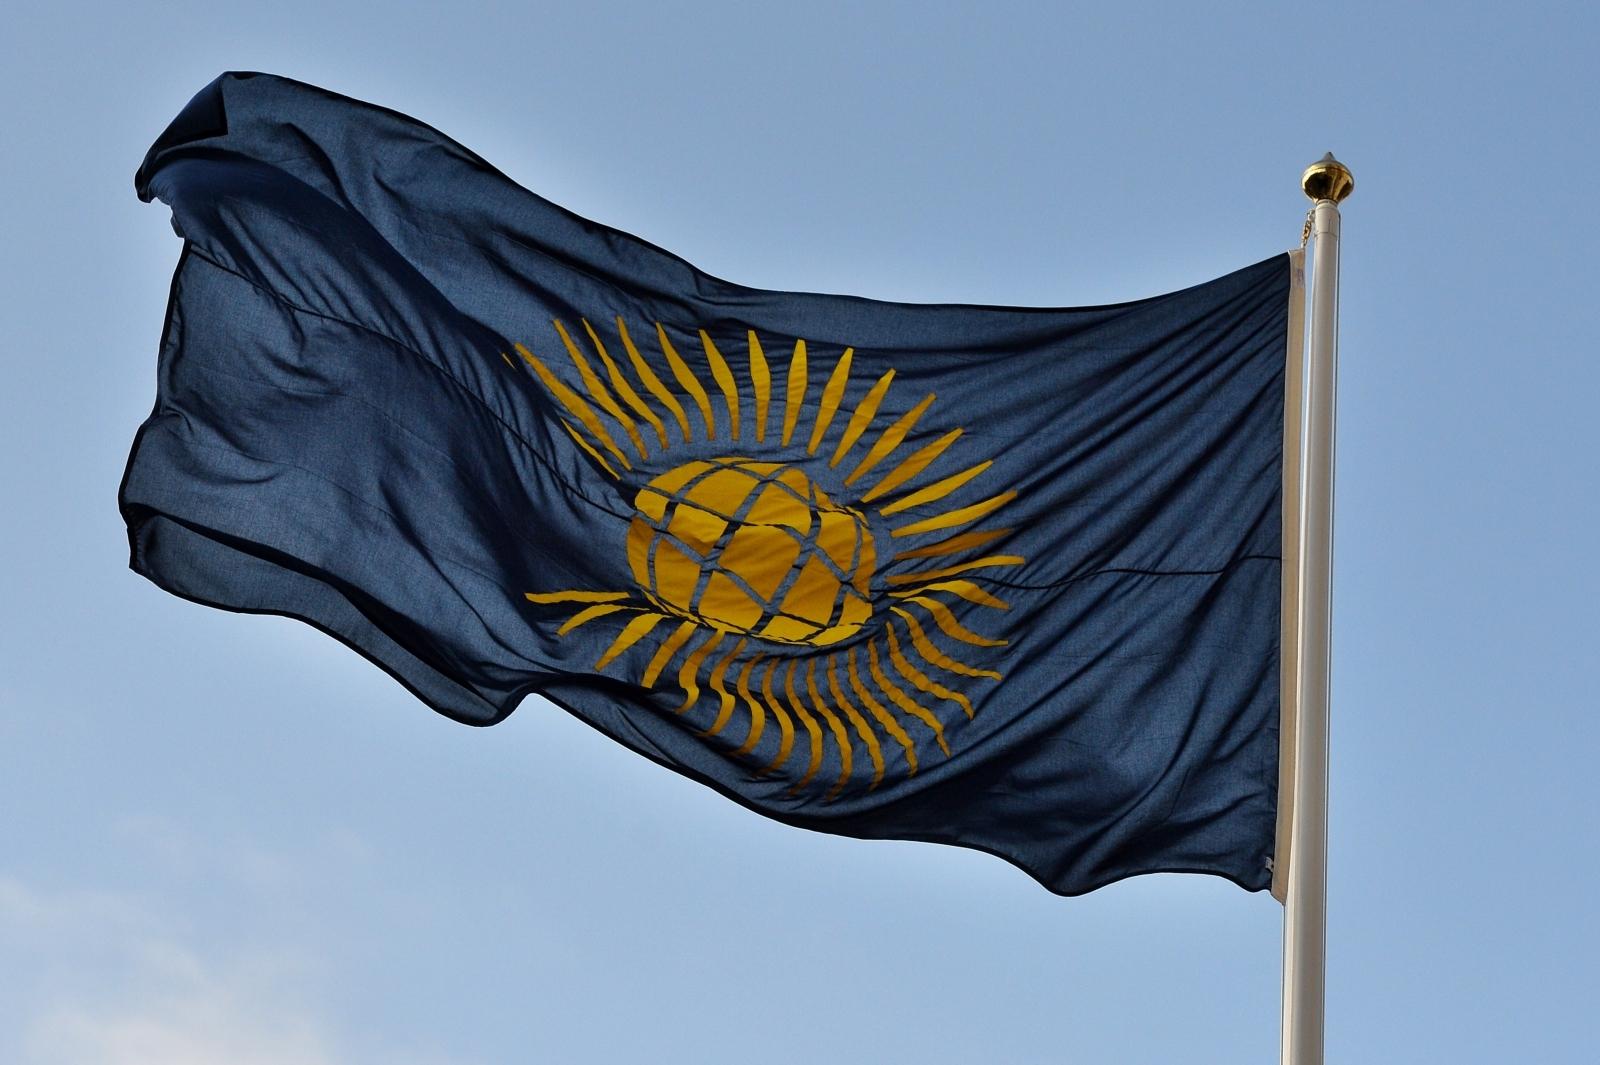 Commonwealth flag